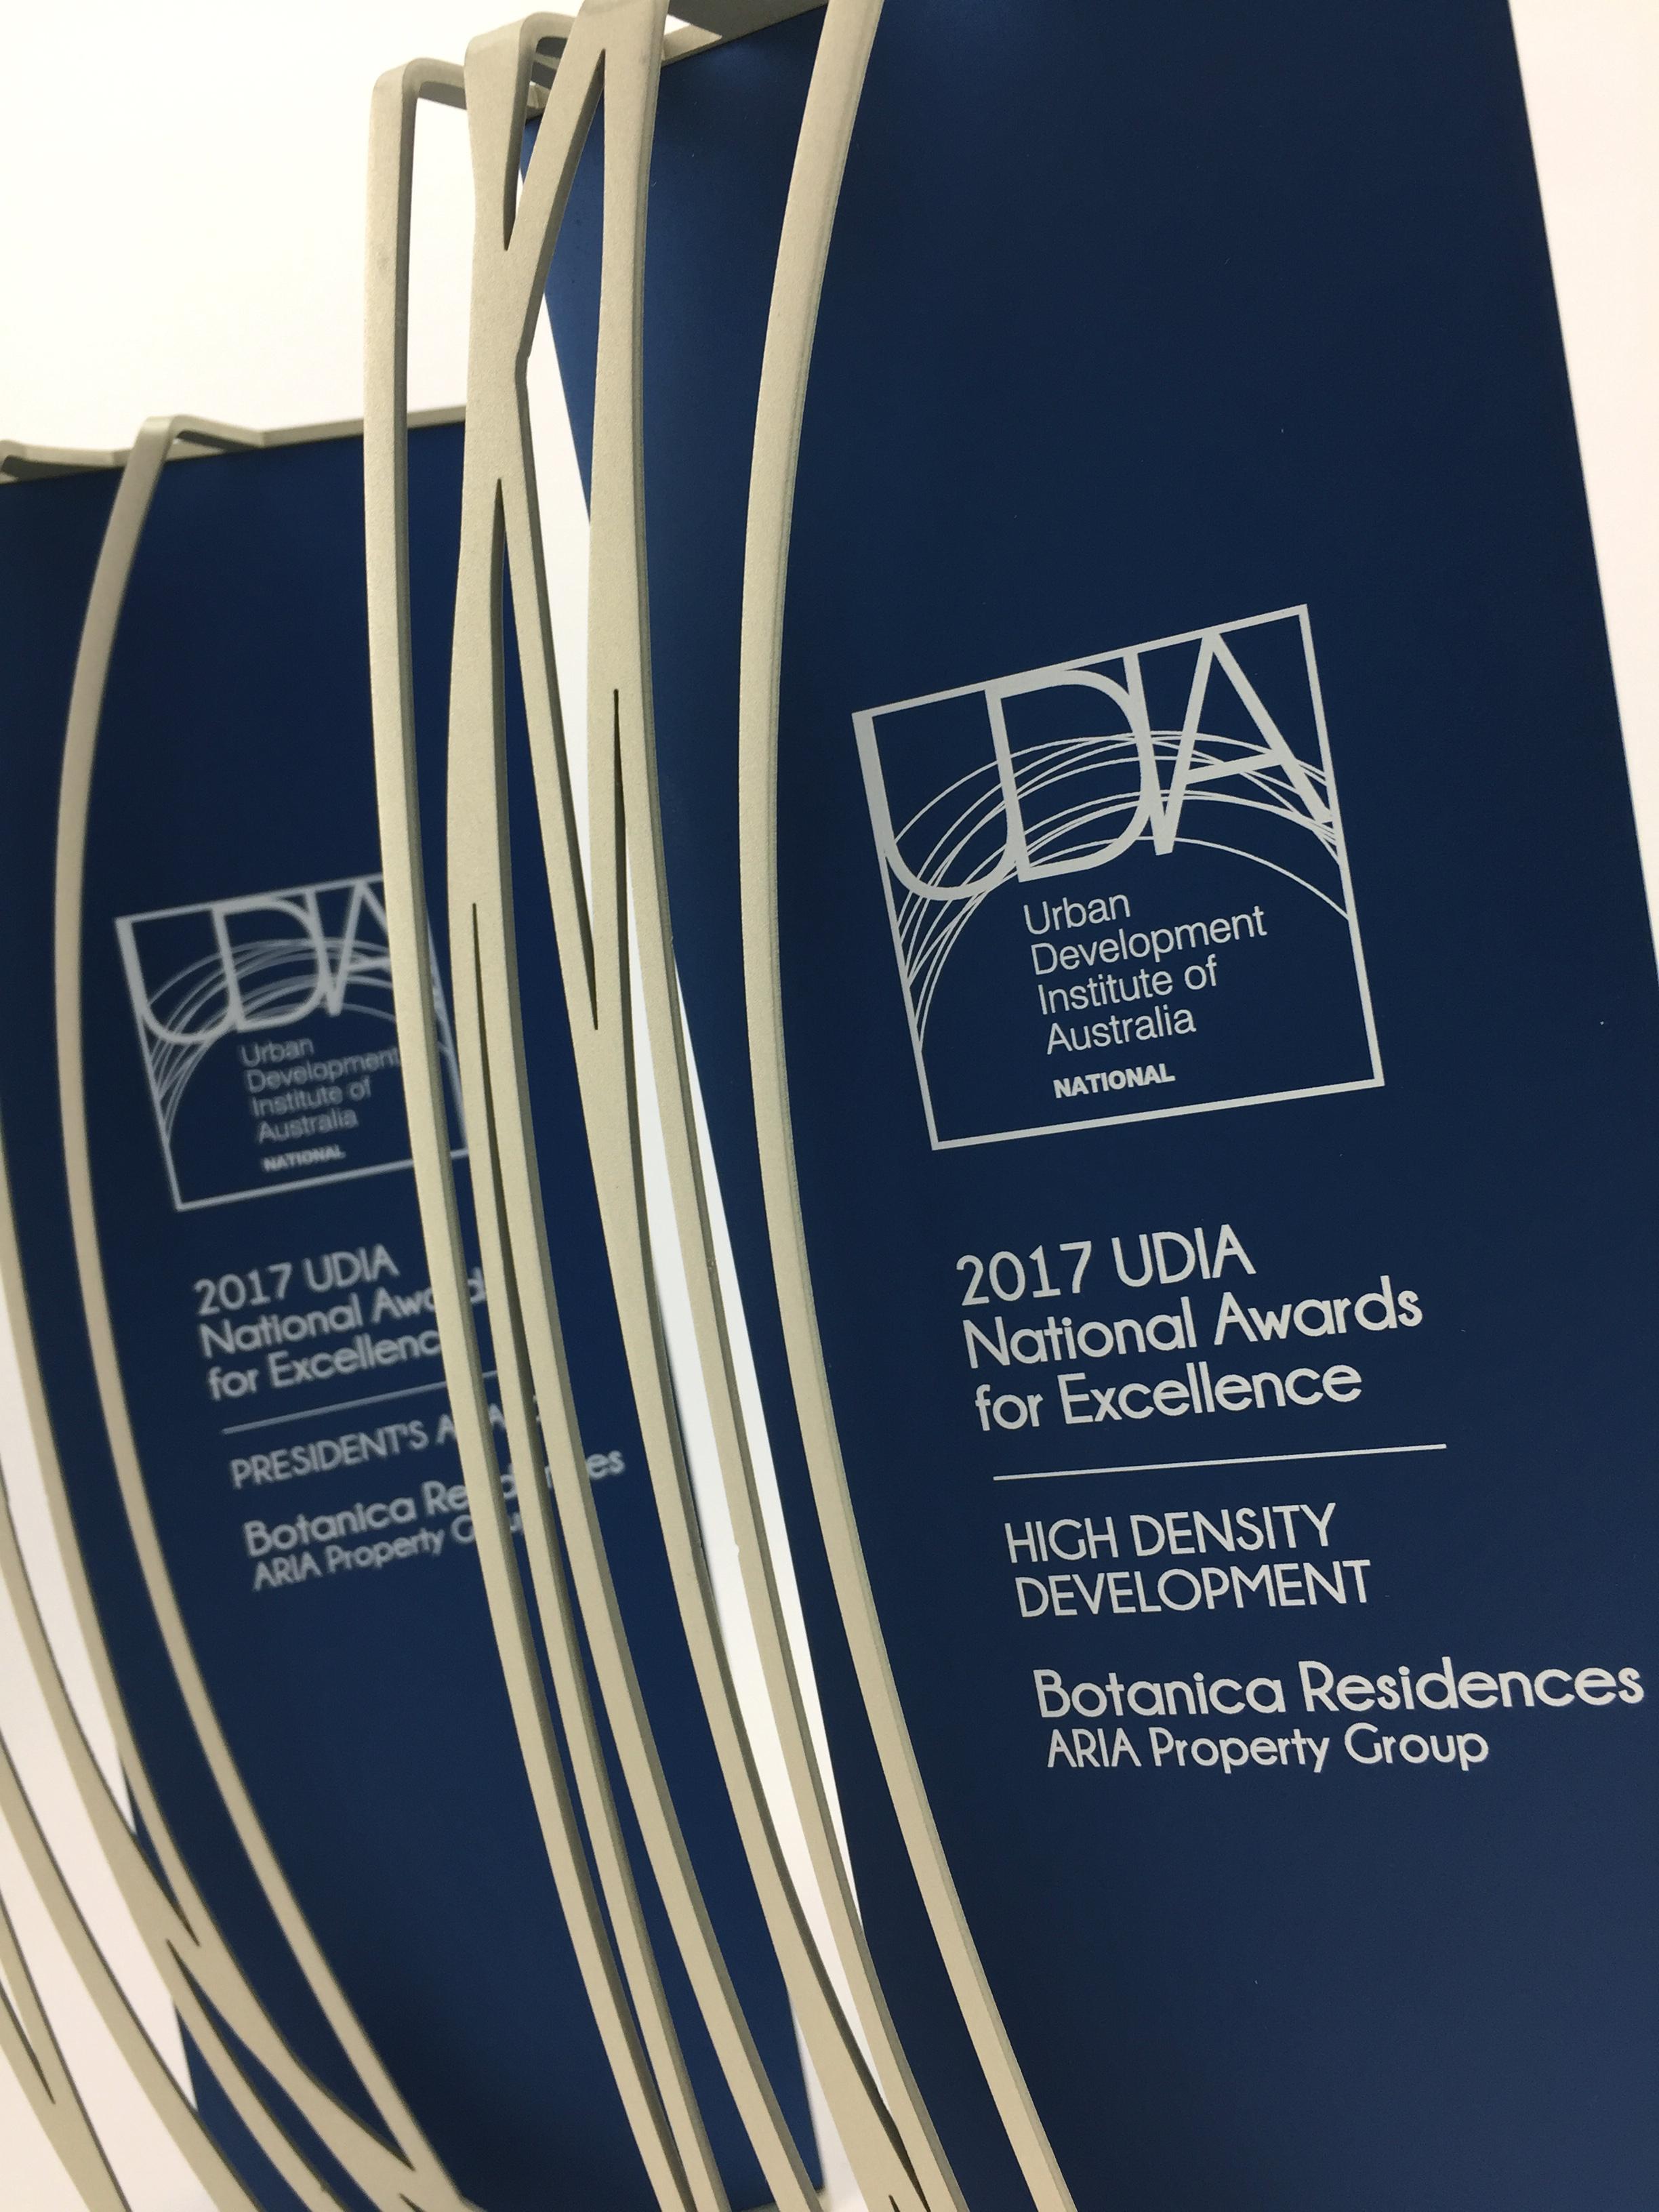 udia-national-awards-aluminium-trophy-02.jpg